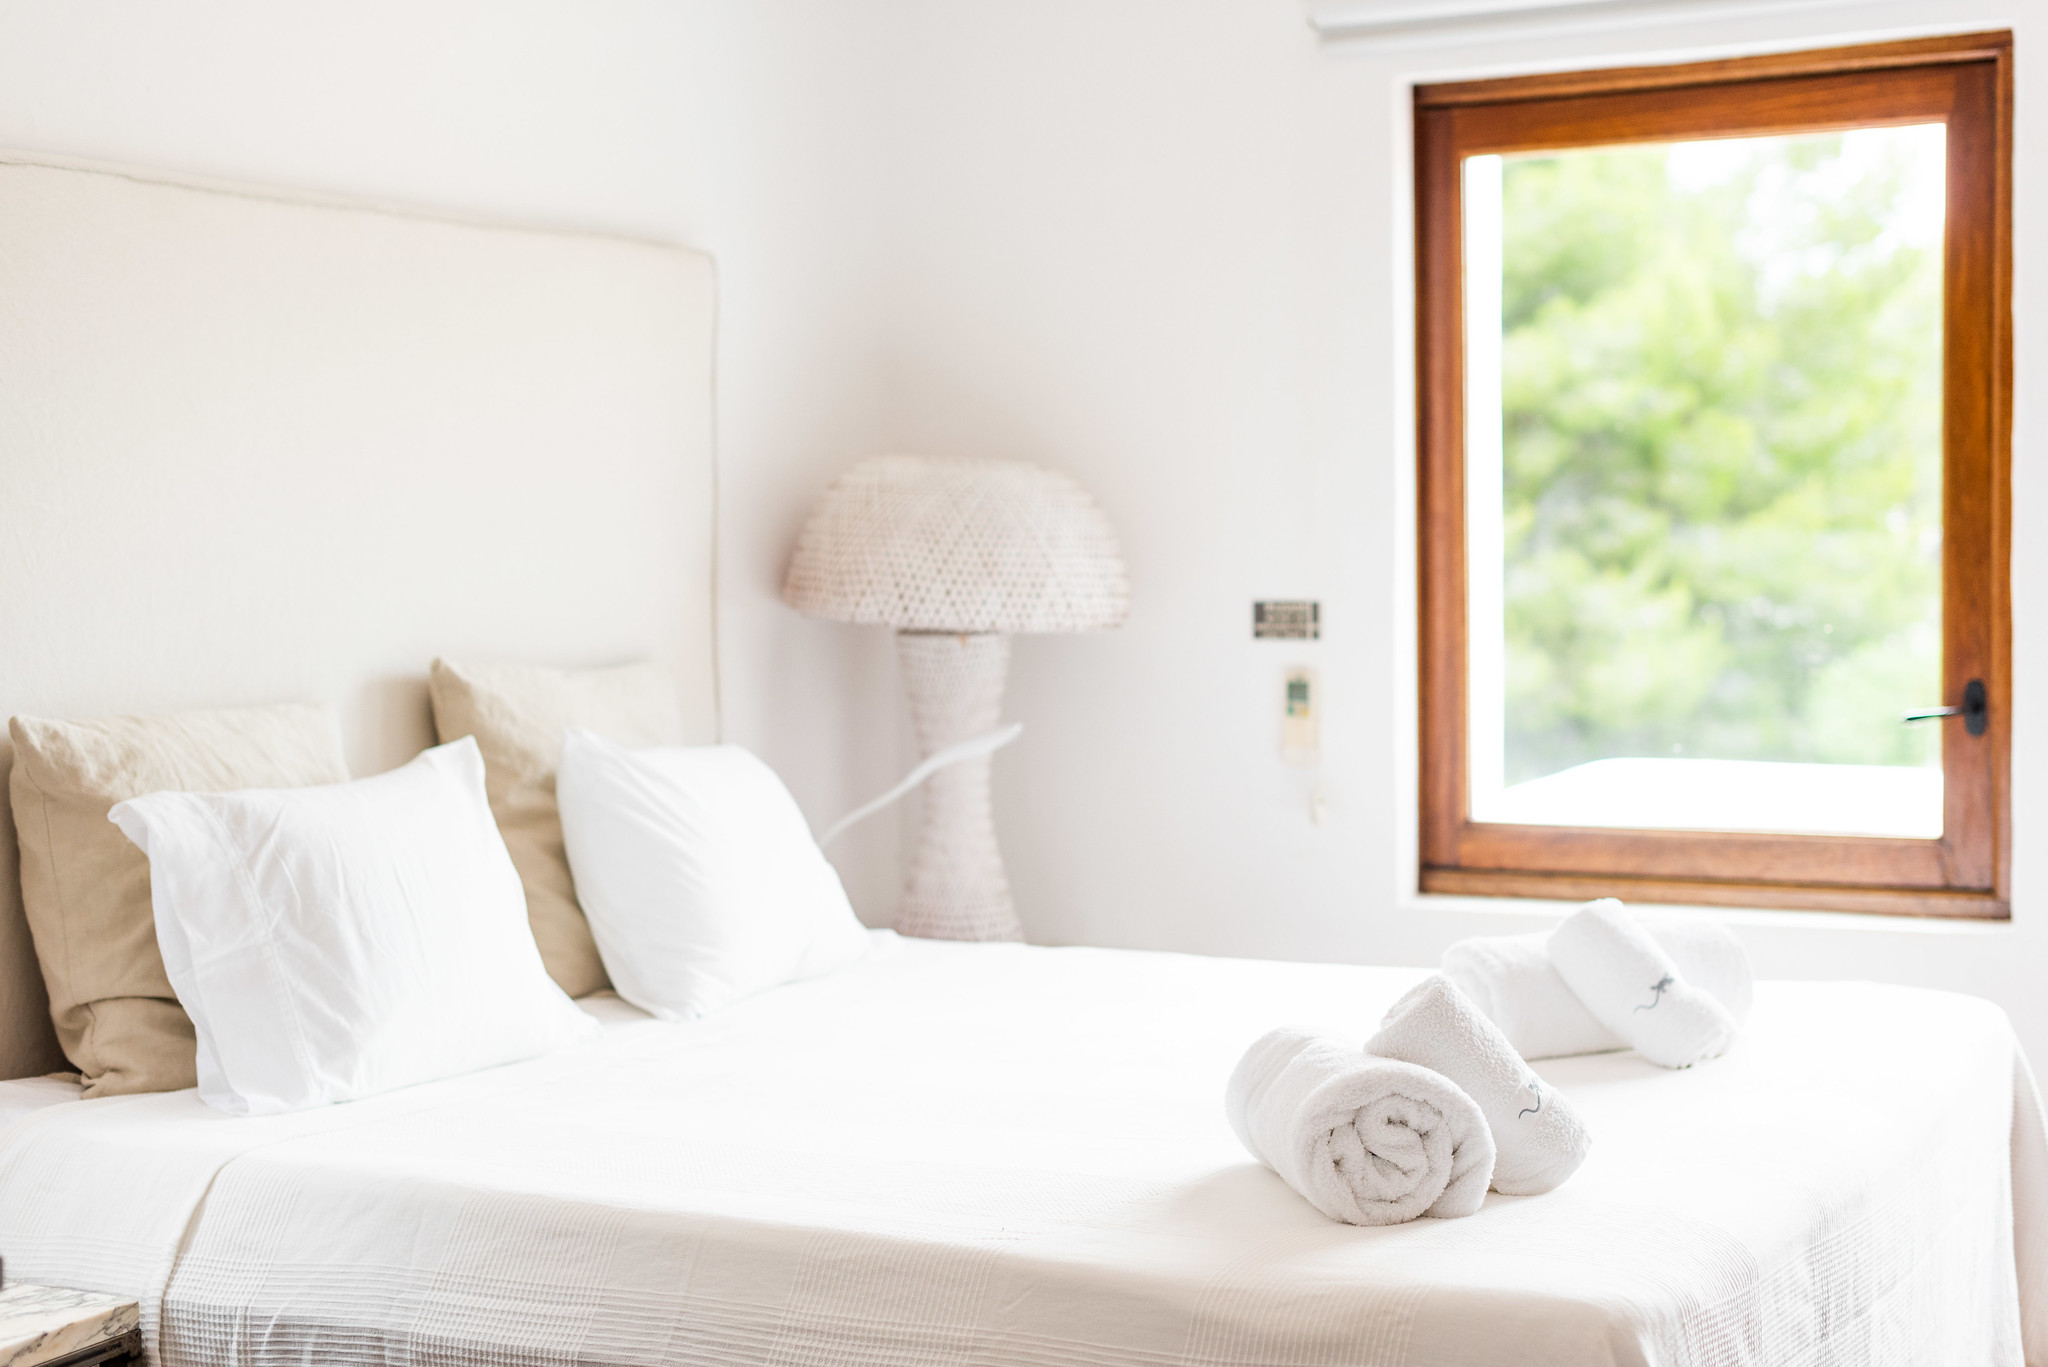 https://www.white-ibiza.com/wp-content/uploads/2020/05/white-ibiza-villas-can-lyra-room.jpg